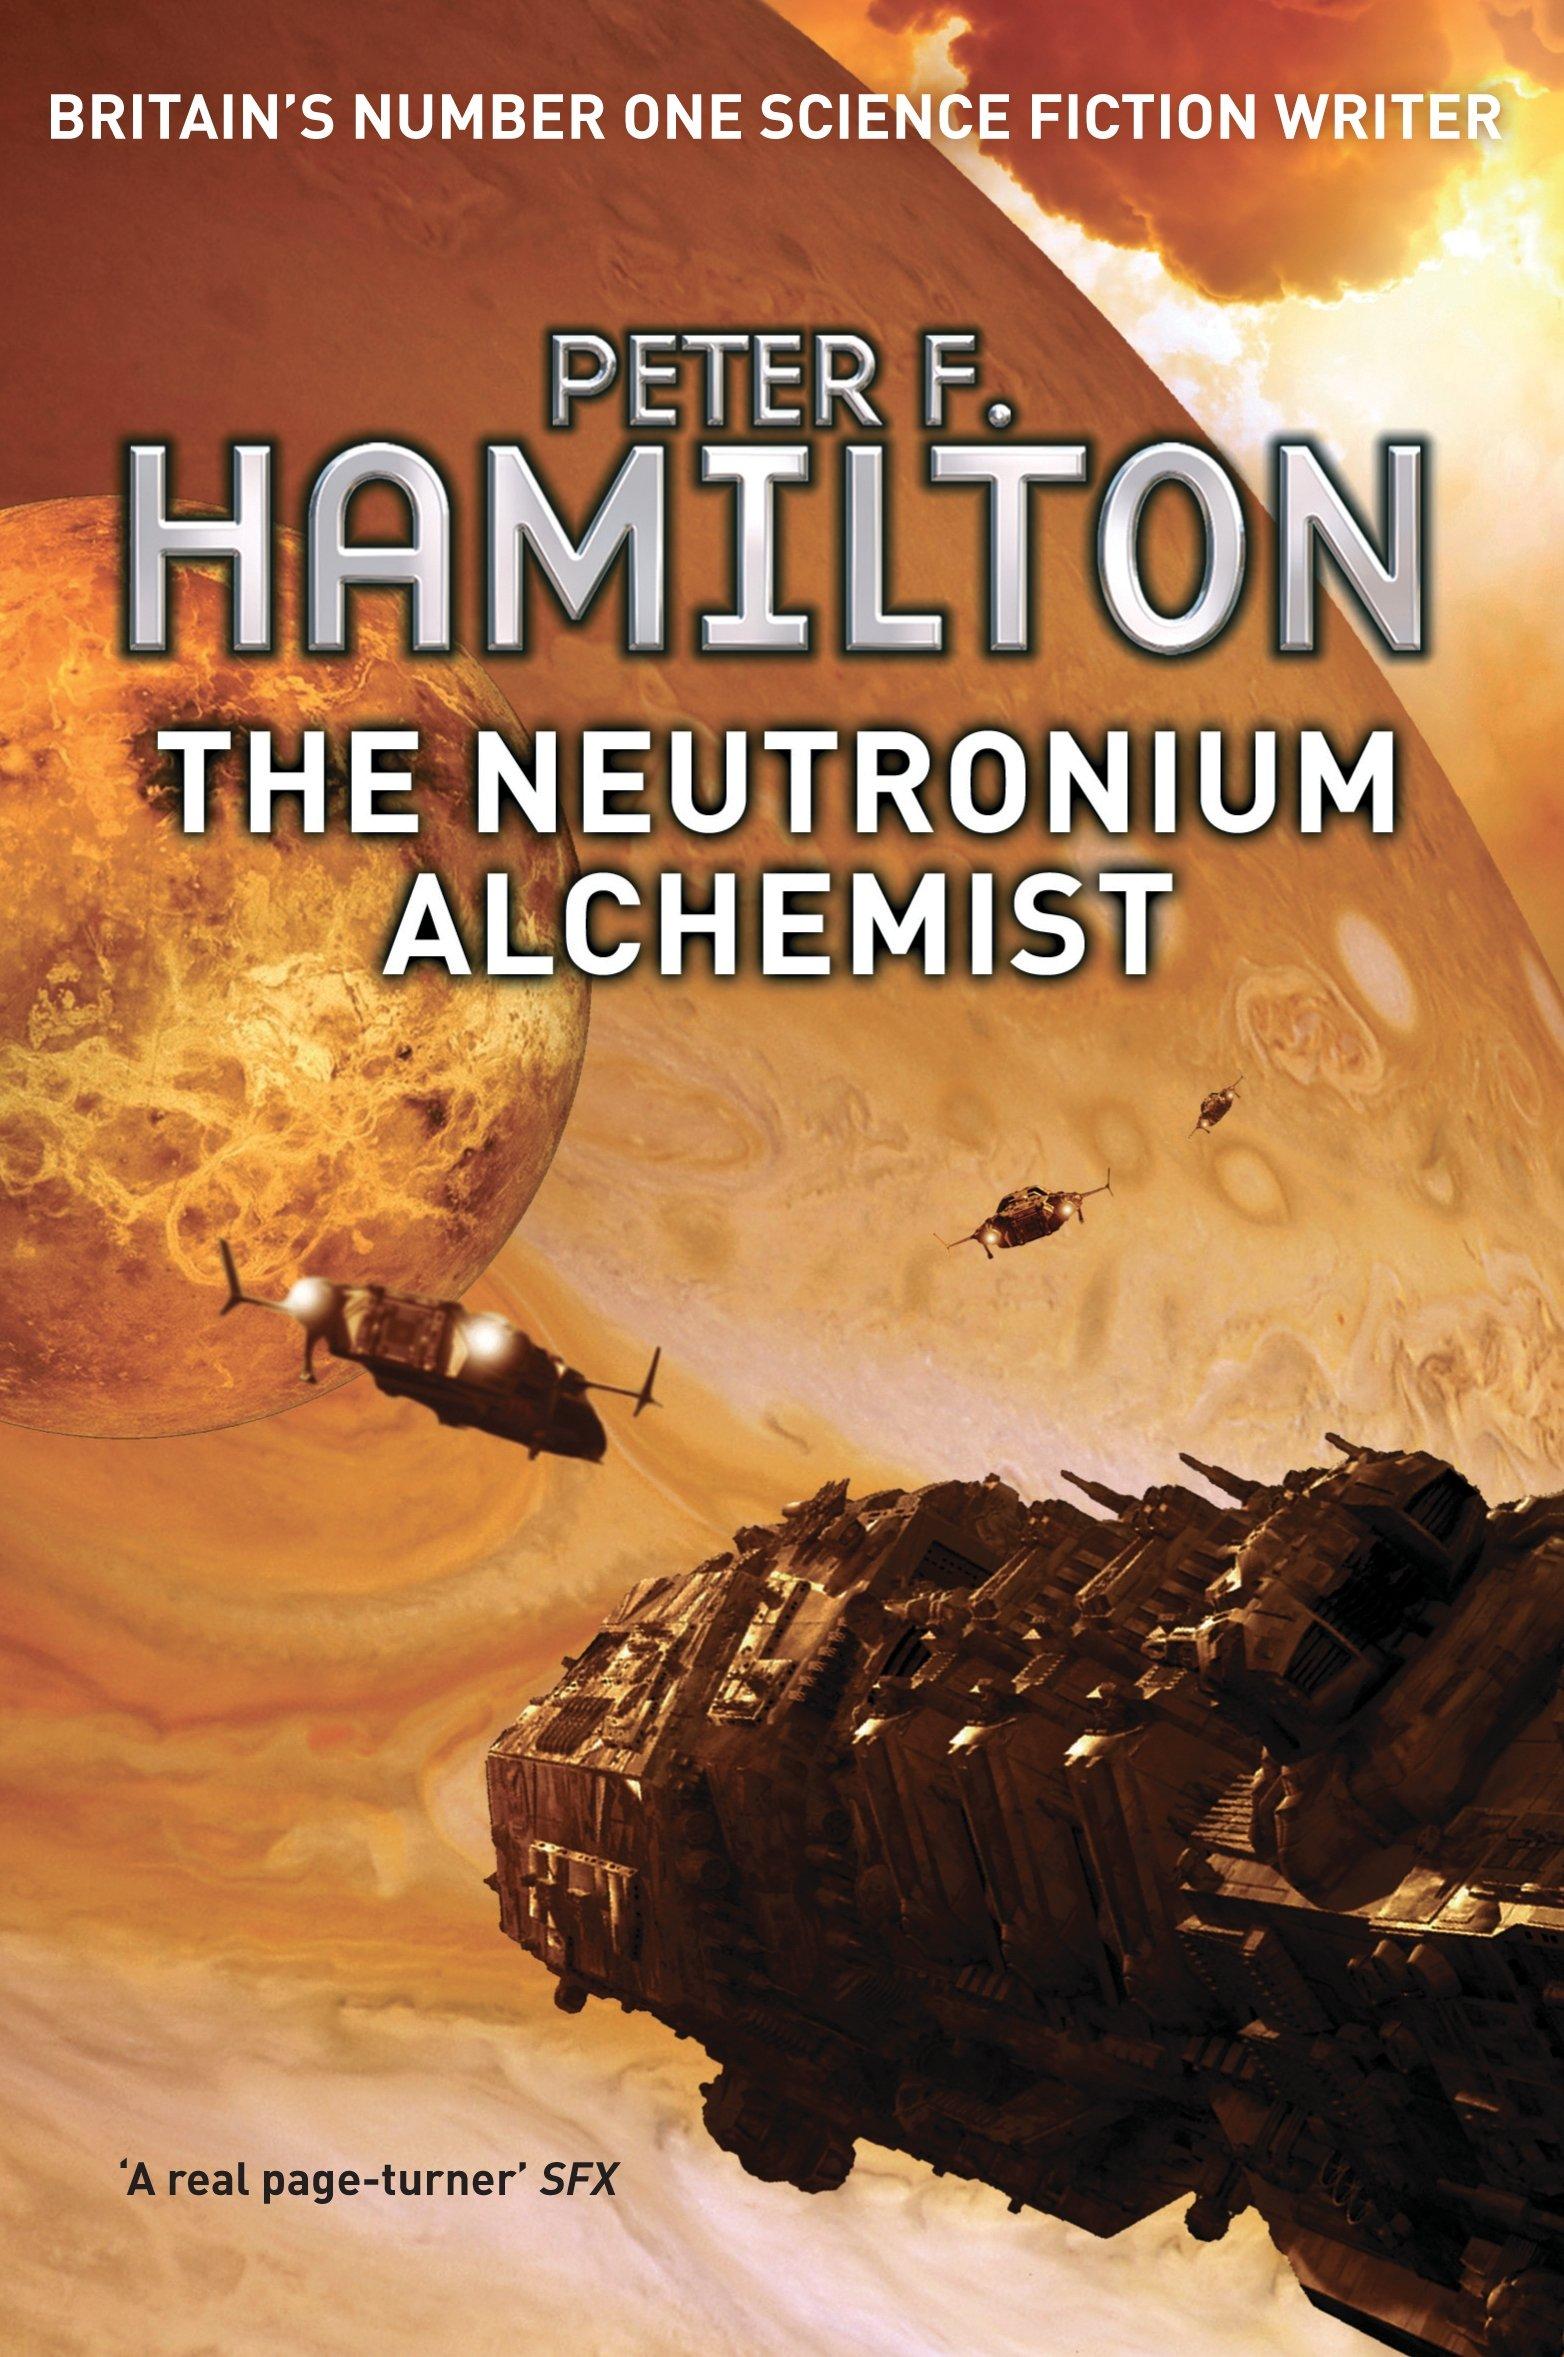 the neutronium alchemist 2 3 the night s dawn trilogy  the neutronium alchemist 2 3 the night s dawn trilogy co uk peter f hamilton 9781447208587 books